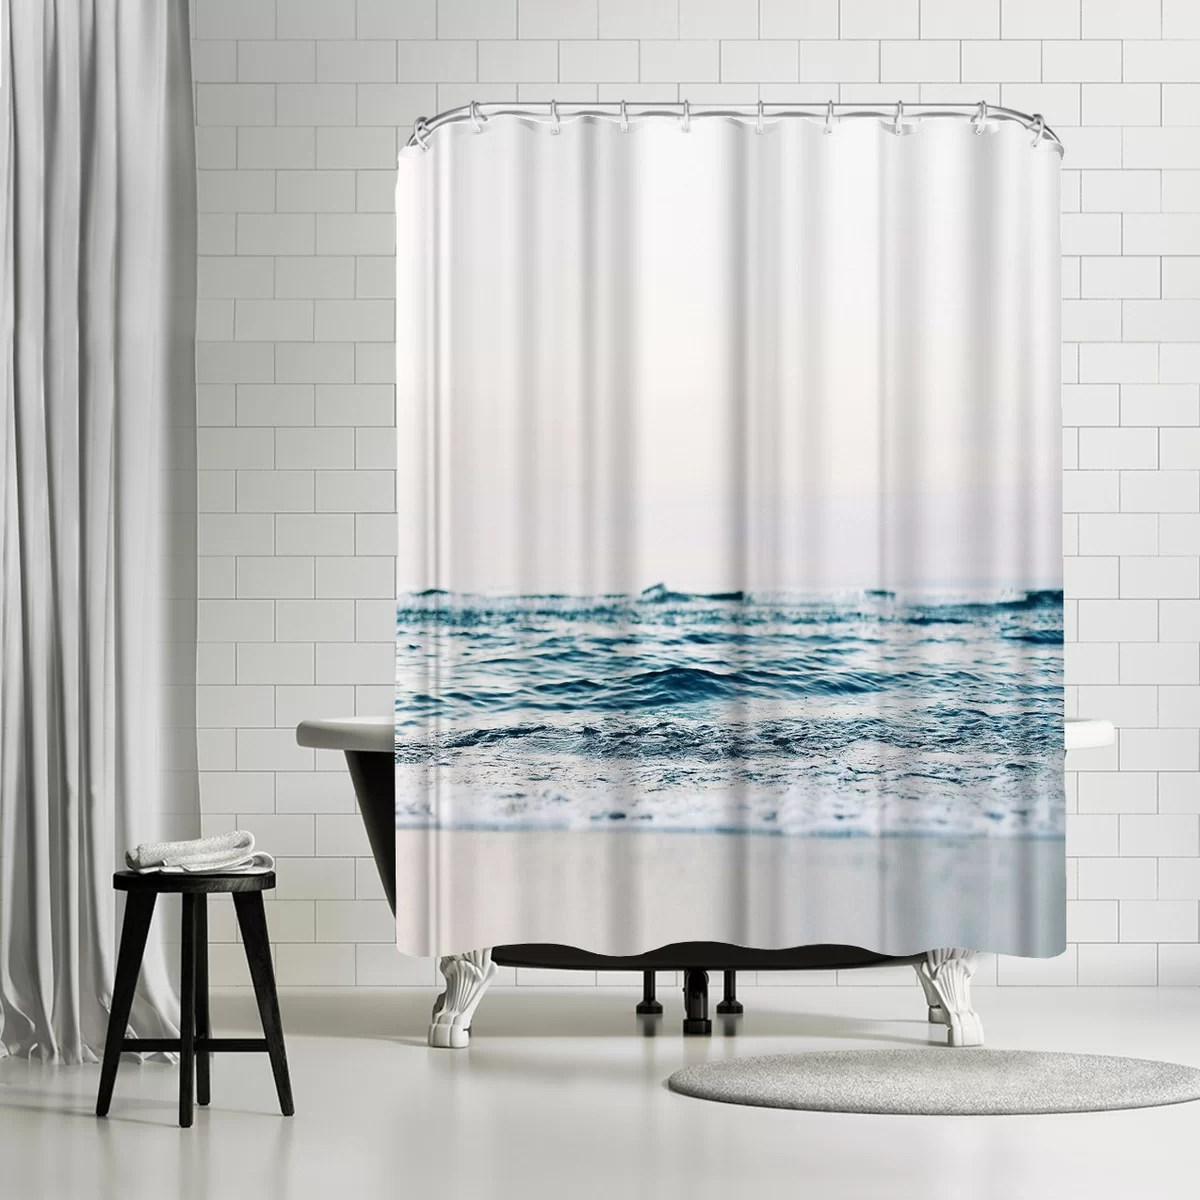 sisi and seb ocean wave single shower curtain